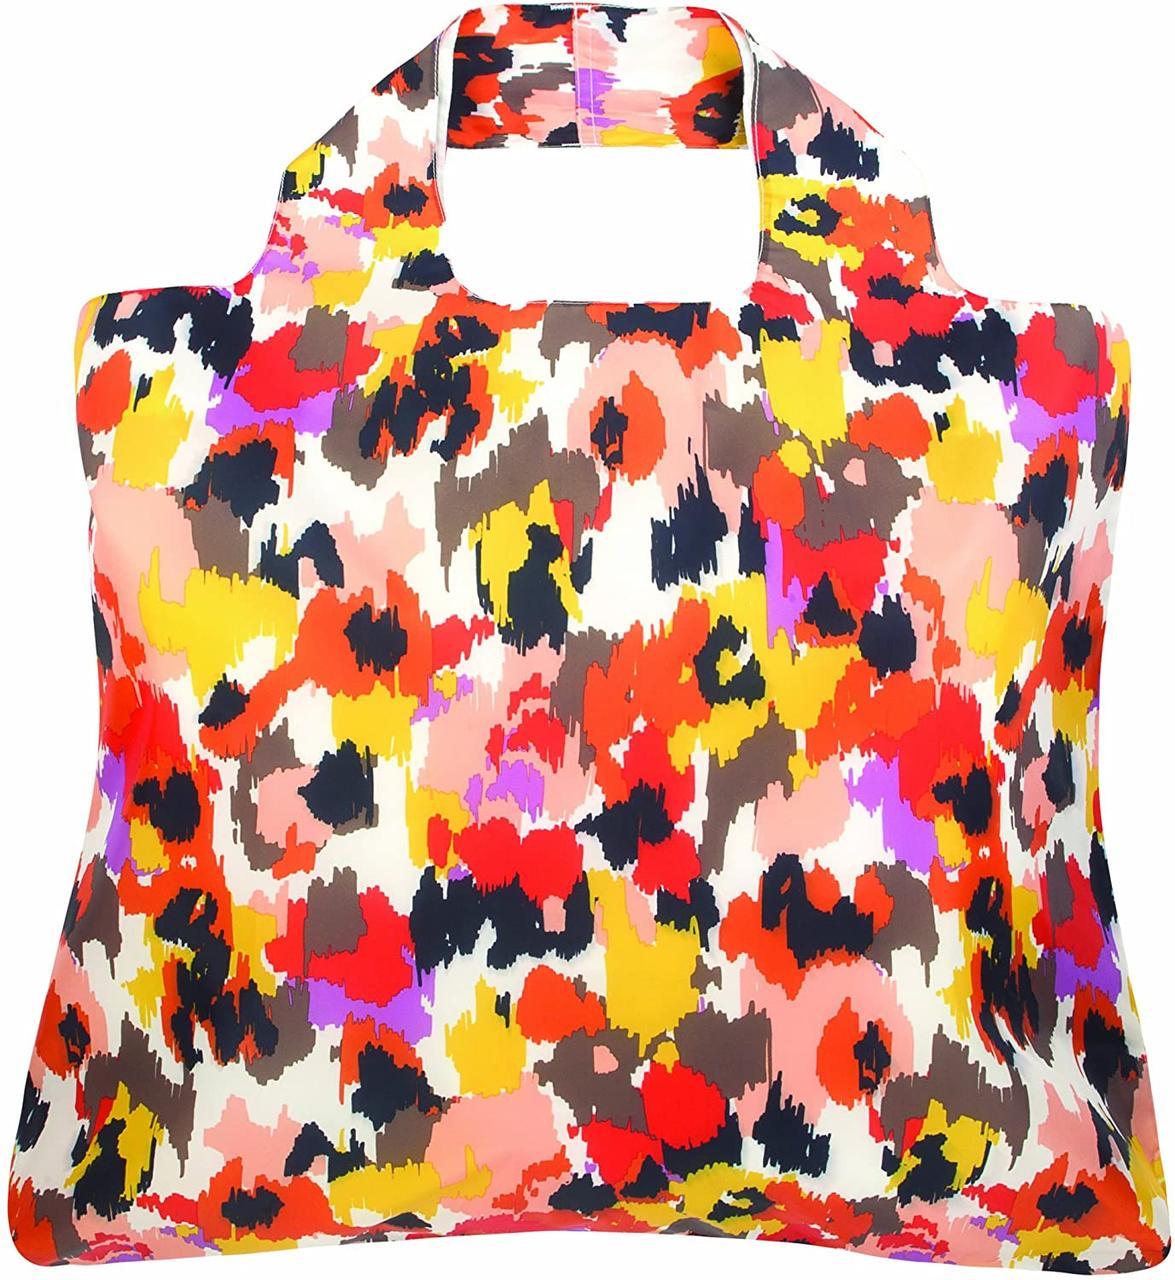 Женская модная сумочка авоська. Mai Tai. Bag 2. Envirosax